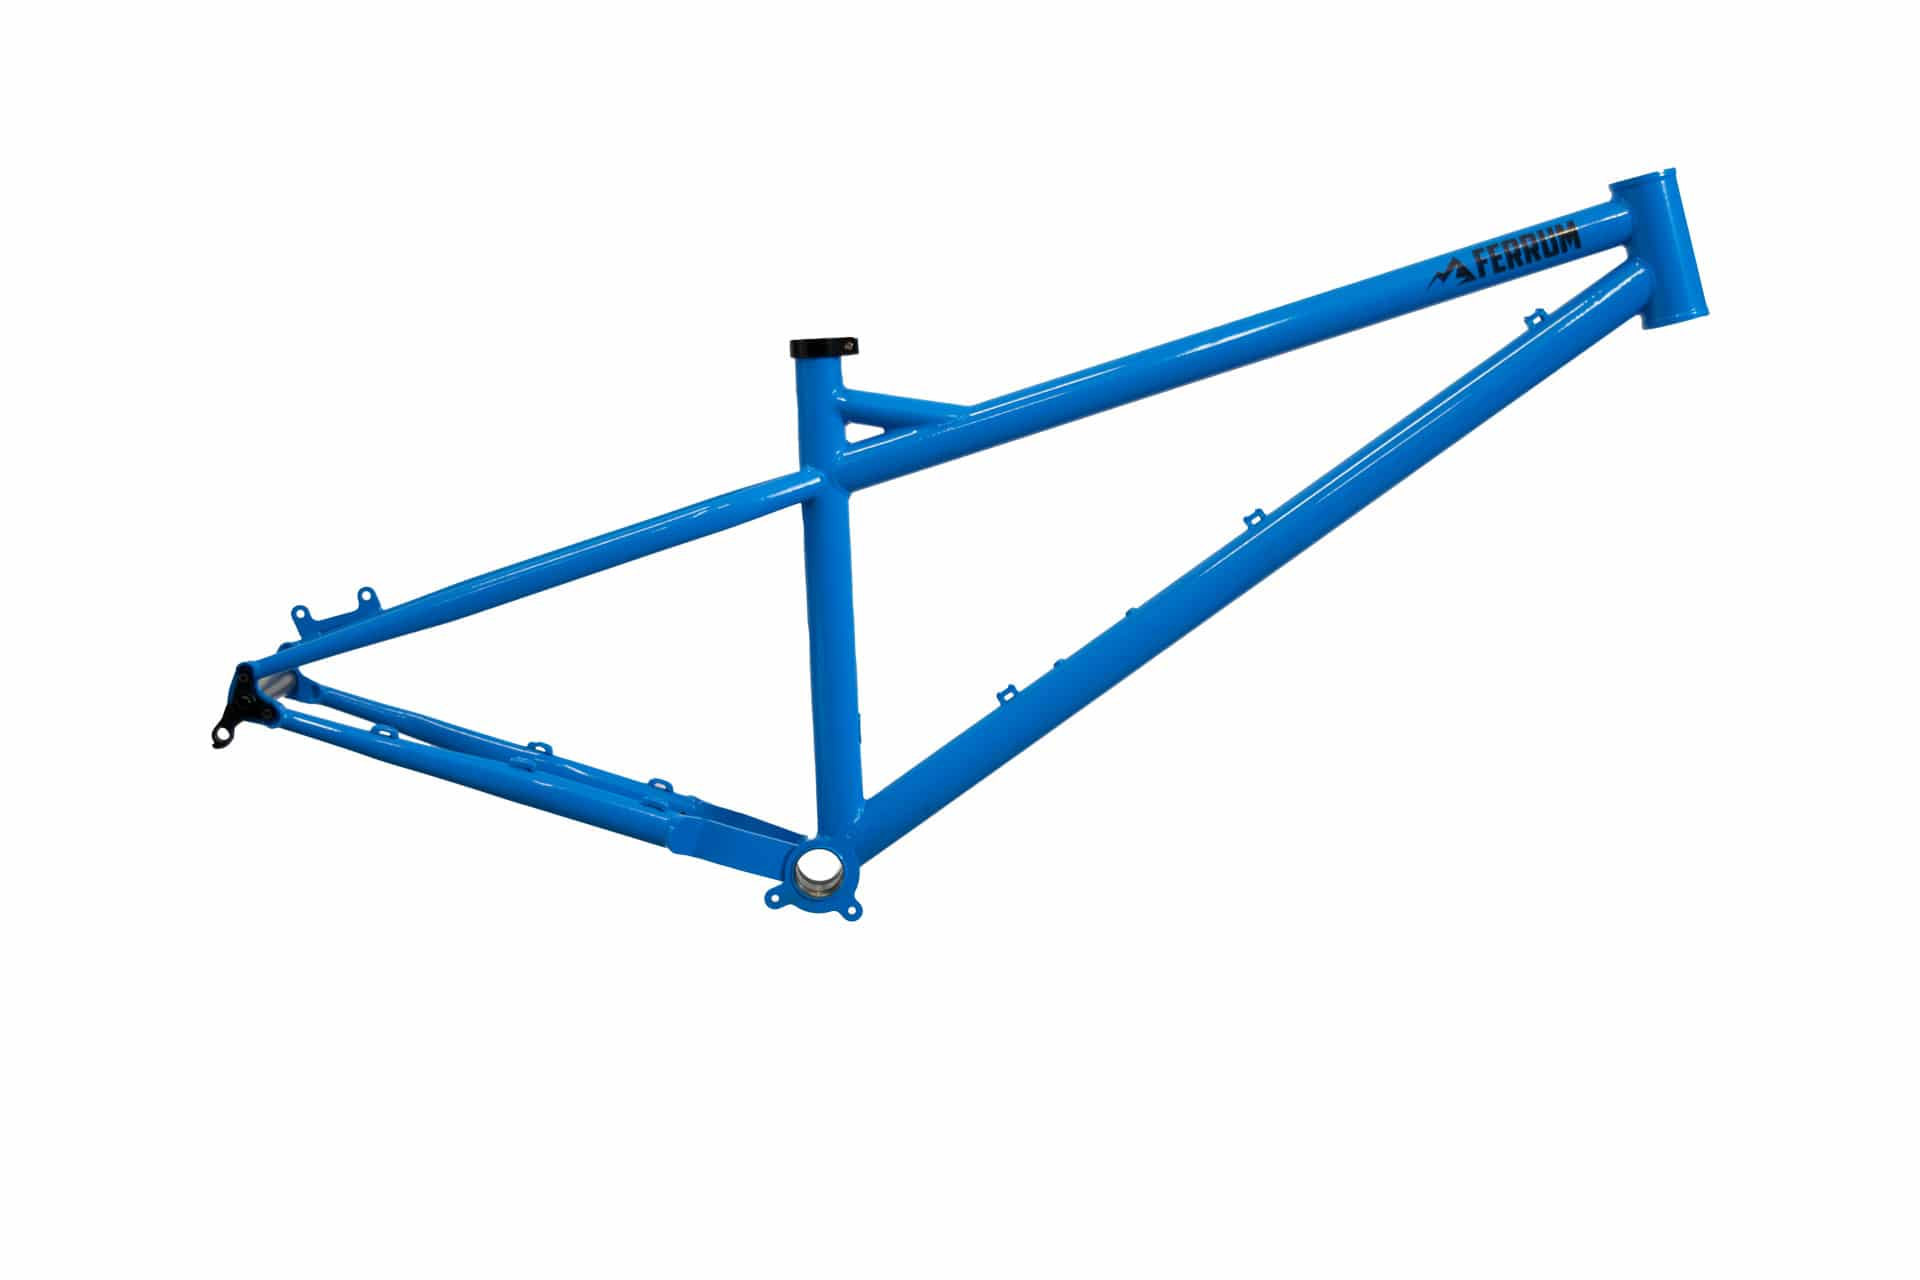 Best Hardtail Mountain Bike Frame